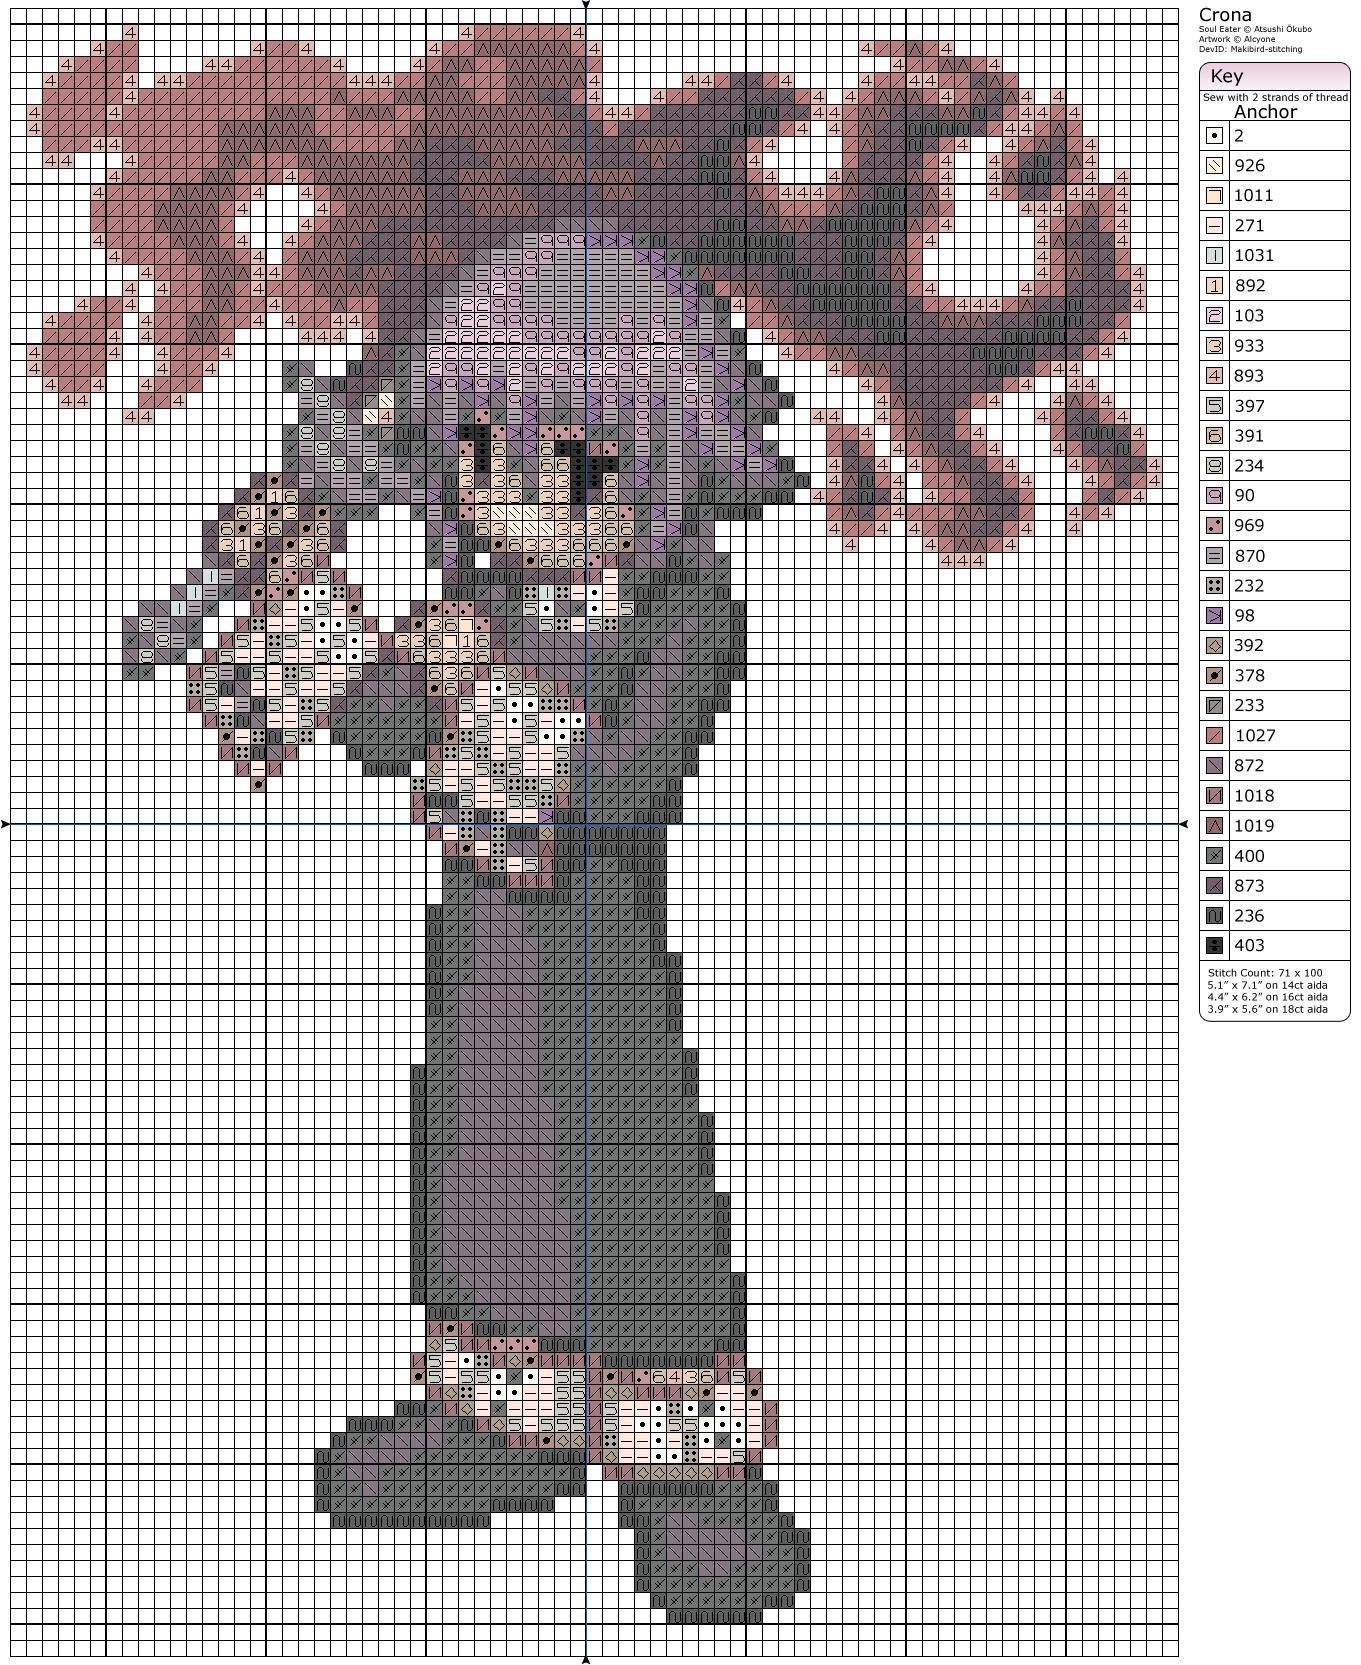 Soul Eater - Crona by Makibird-Stitching